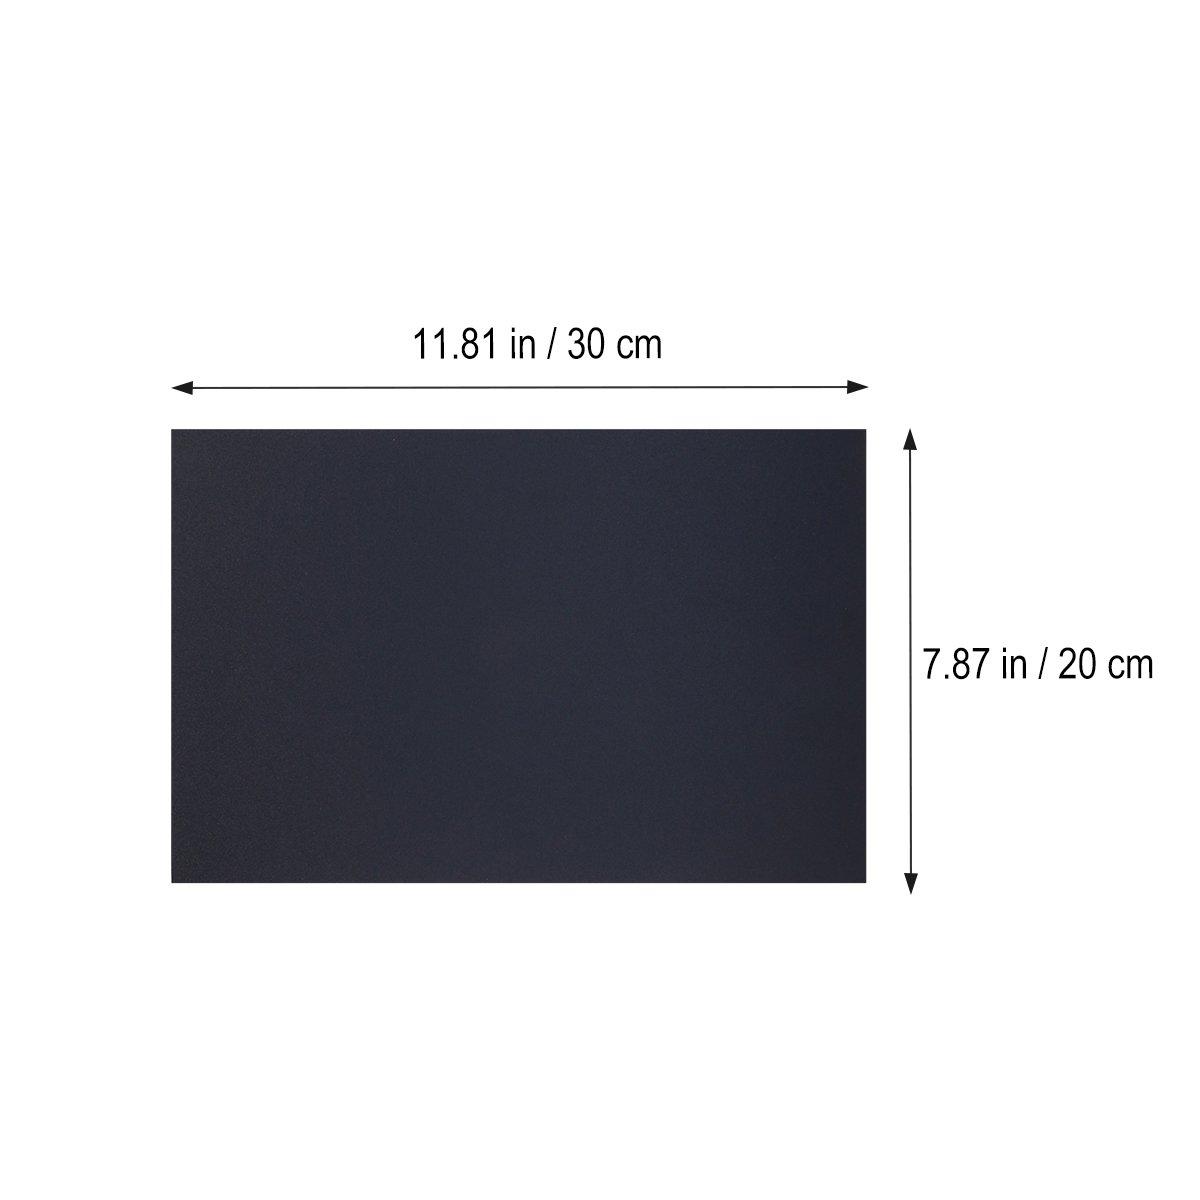 3 Piezas UEETEK Superficie de Impresi/ón 3D 300mm x 200mm